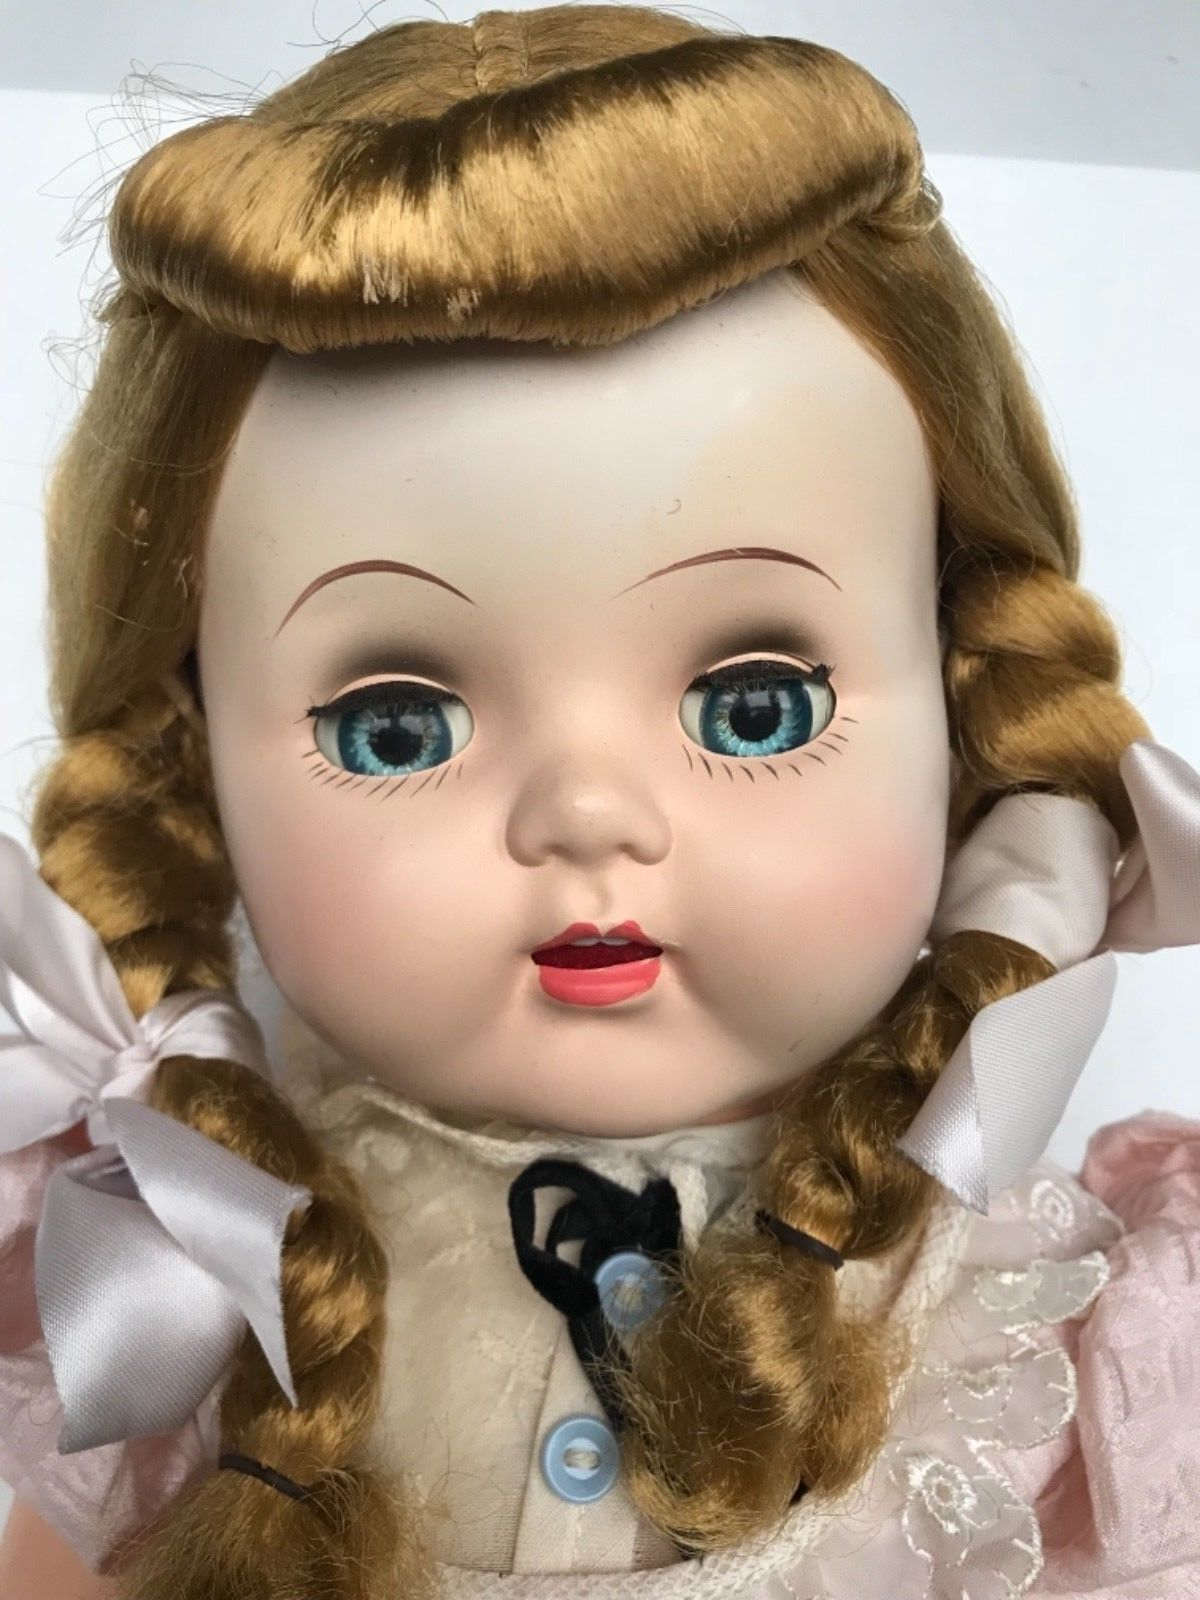 Vintage 1952 MIB Eegee Susan Stroller Saucy Walker baby